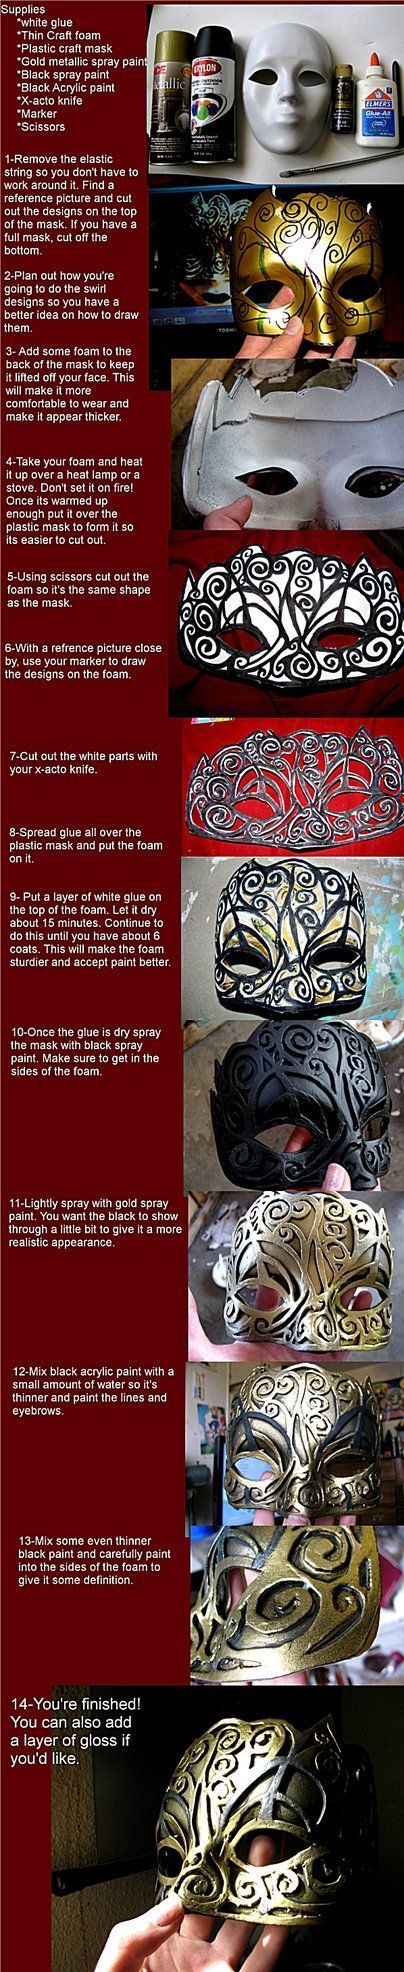 Hellequin Mask Tutorial from AssassinsCreed Brotherhood